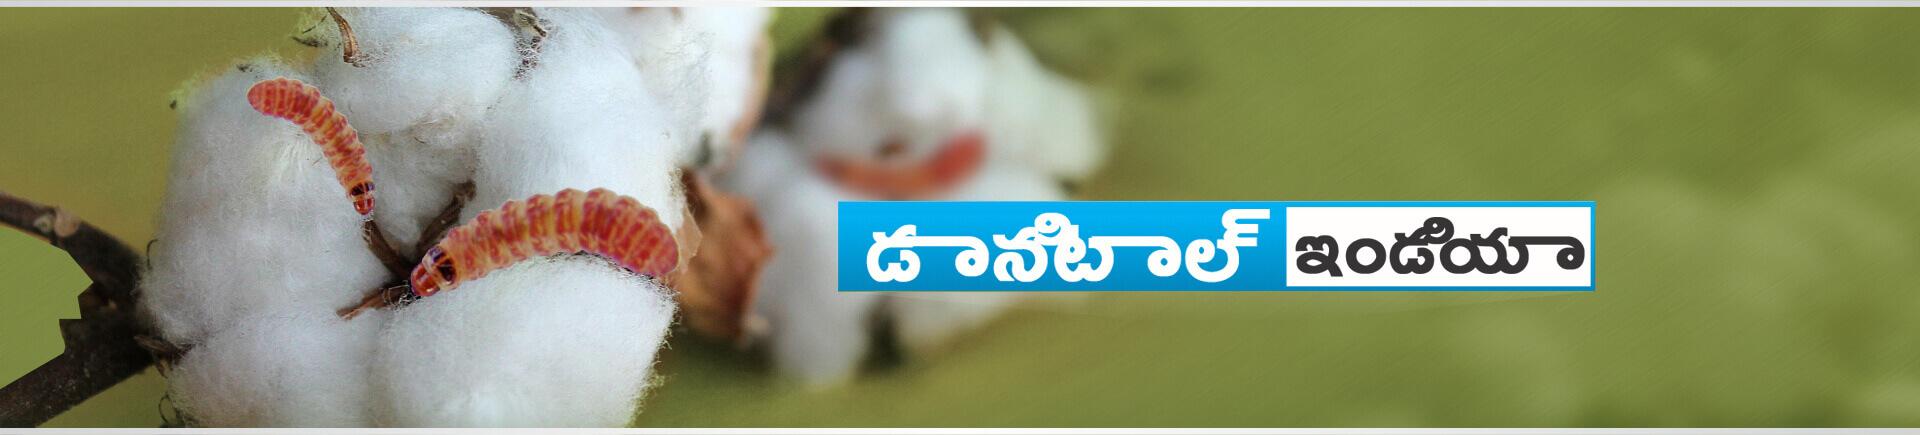 Sumitomo Danitol Website banner telugu